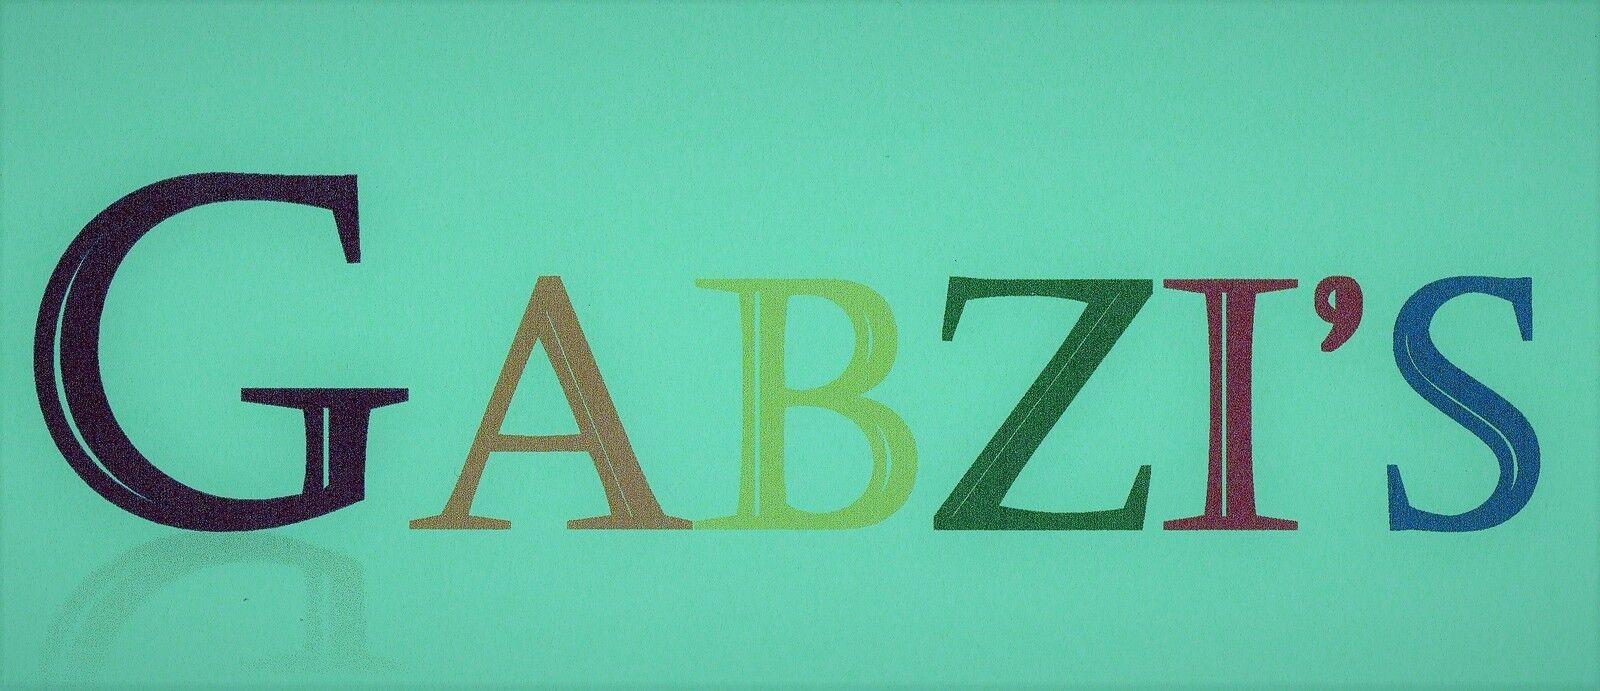 Gabzi's